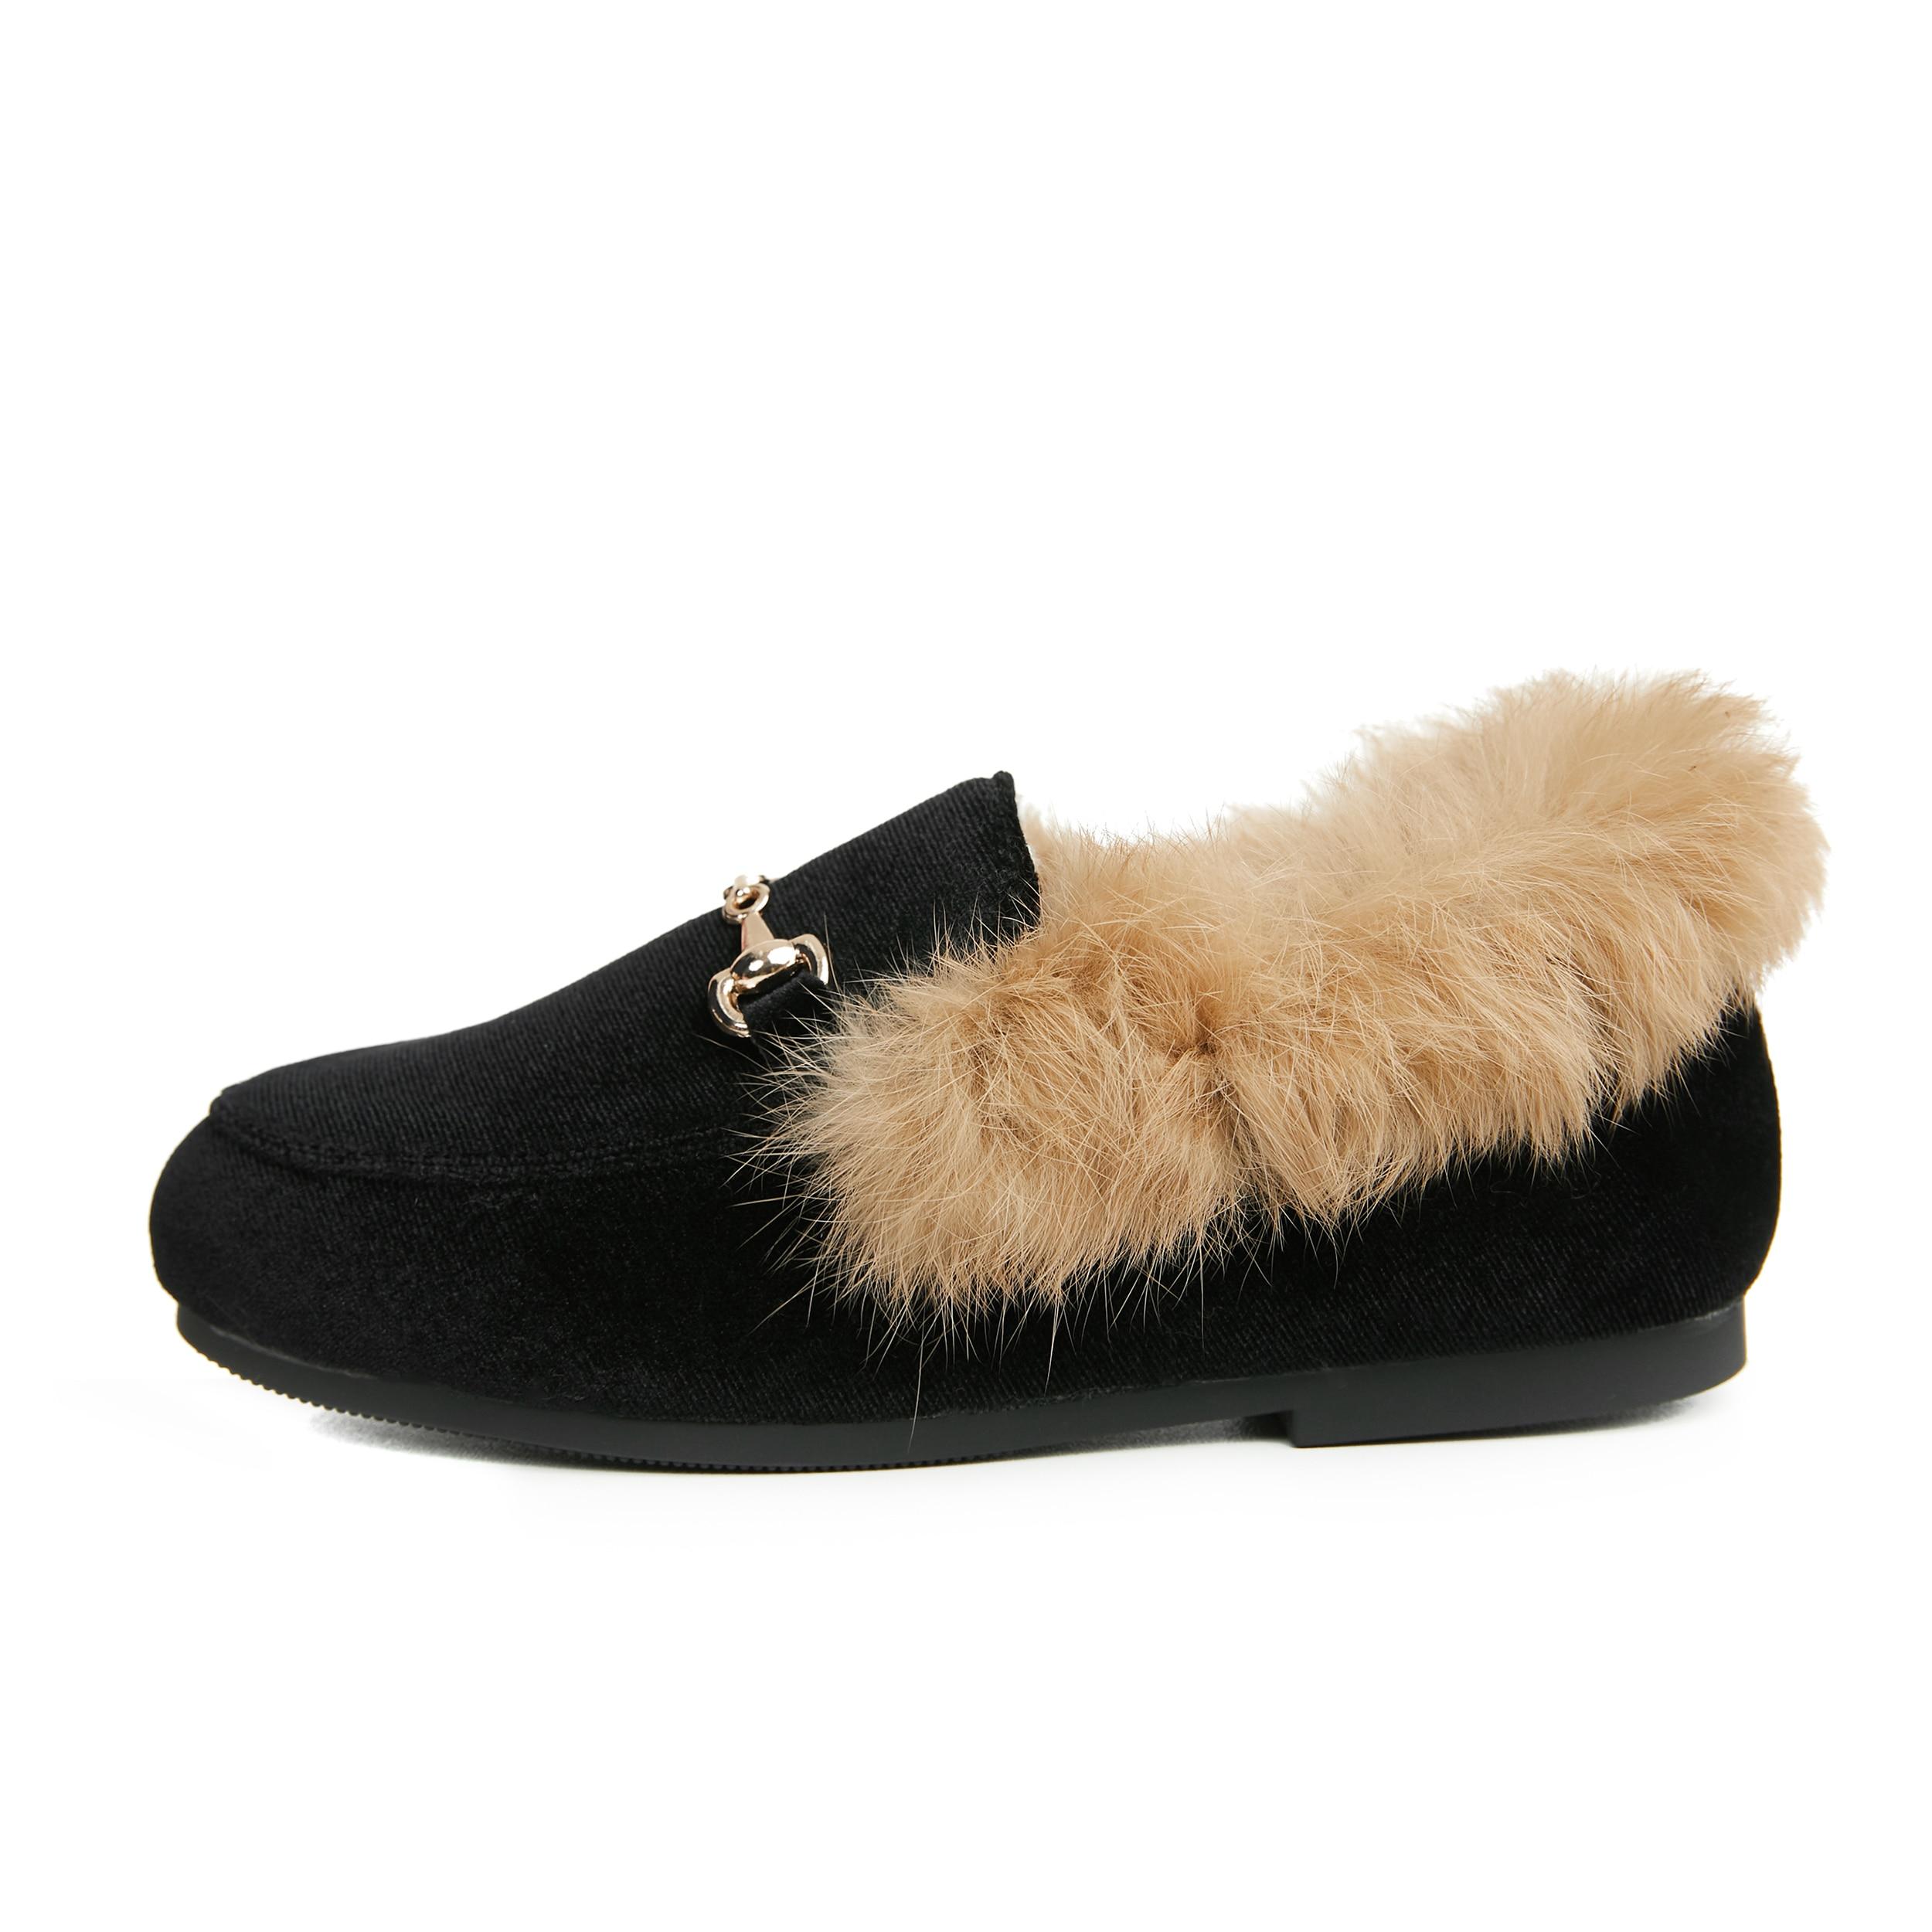 Winter Kids Fur Shoes Children Velvet Shoes Baby Girls Warm Flats Toddler Black Brand Shoes Princess